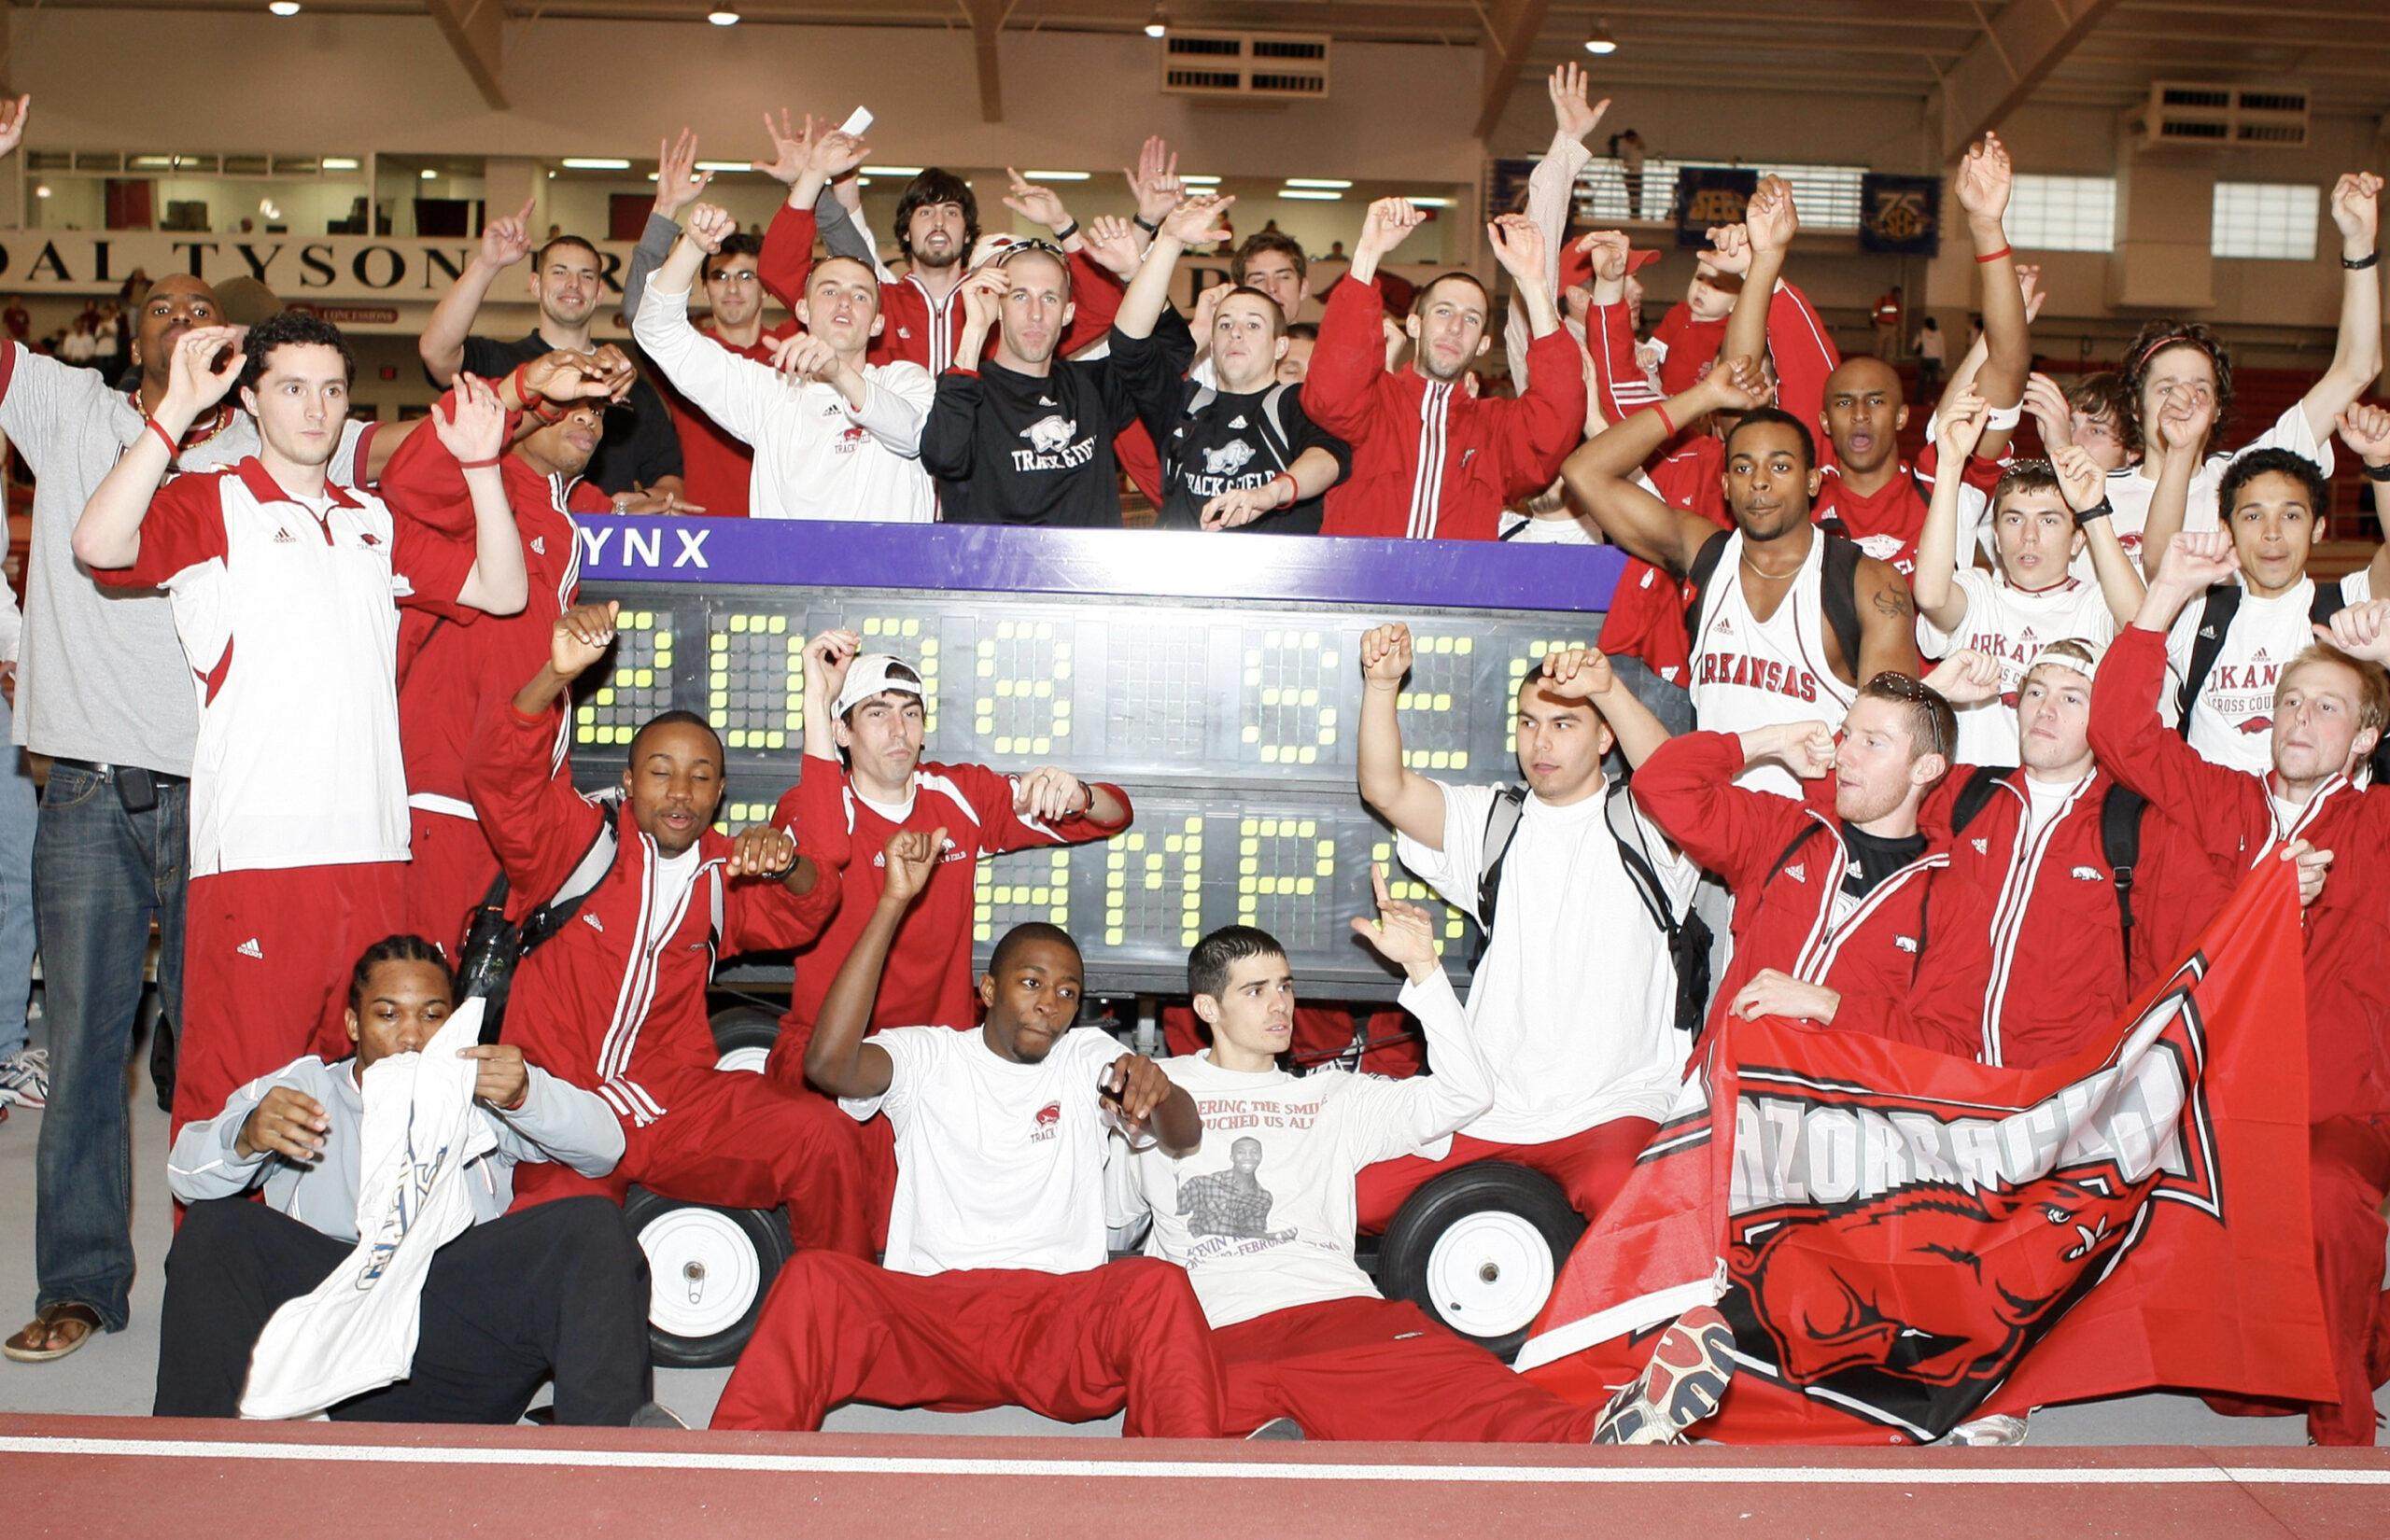 2006 SEC Indoor Champions